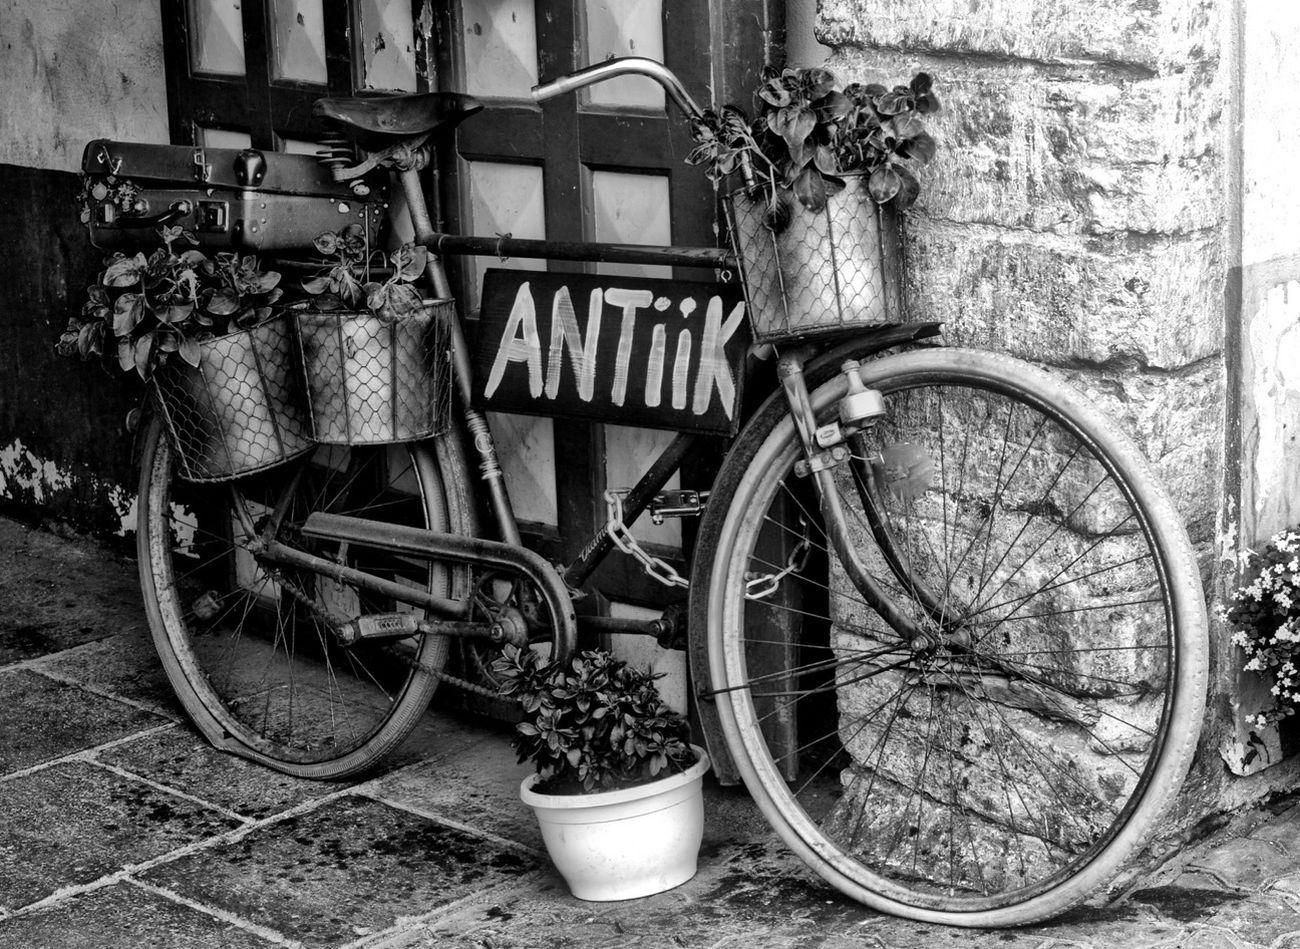 Blackandwhite B/w Daily Streetphotography Simplicity